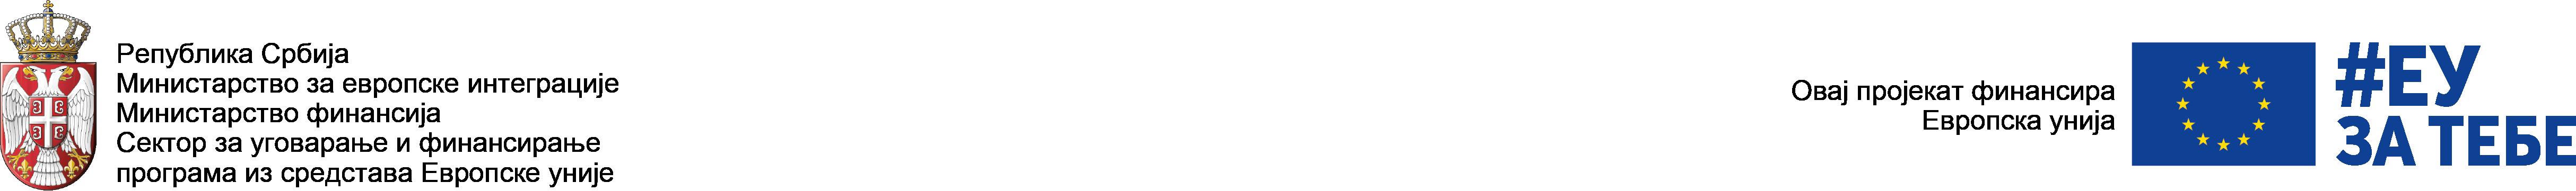 EU programi logo